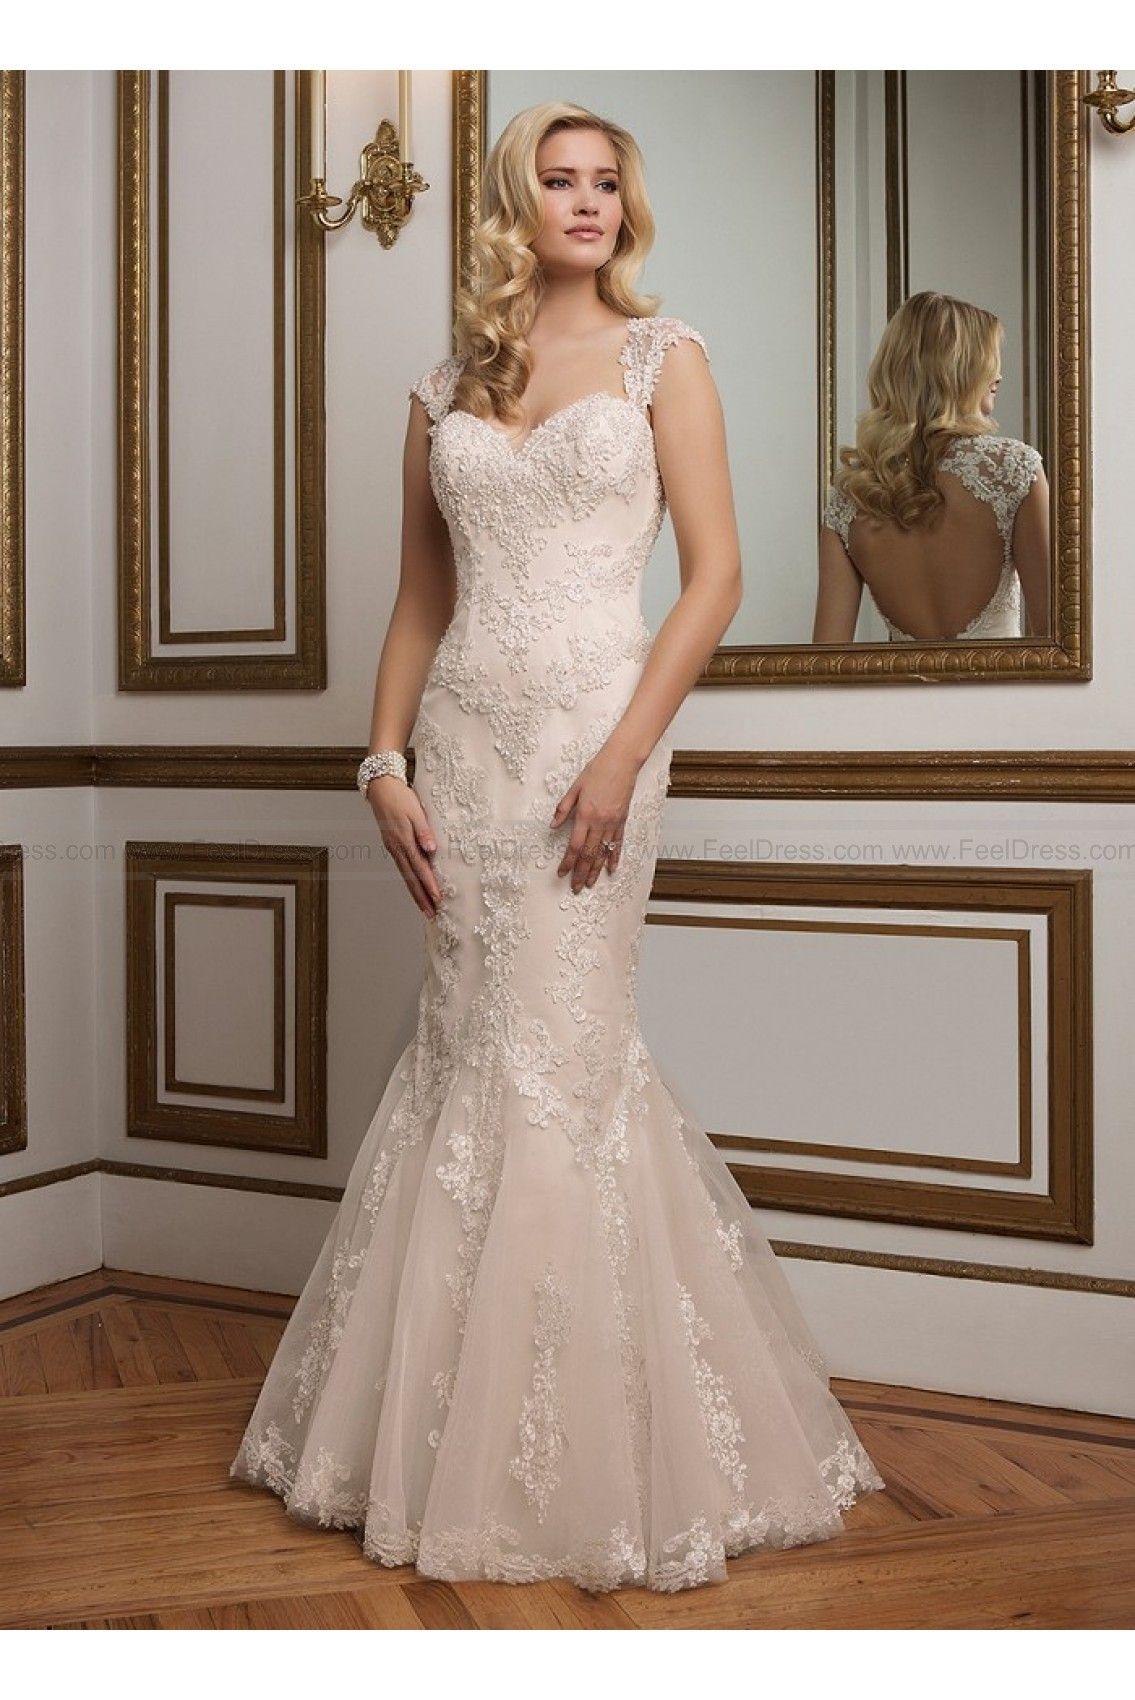 Justin alexander wedding dress style 8841 wedding